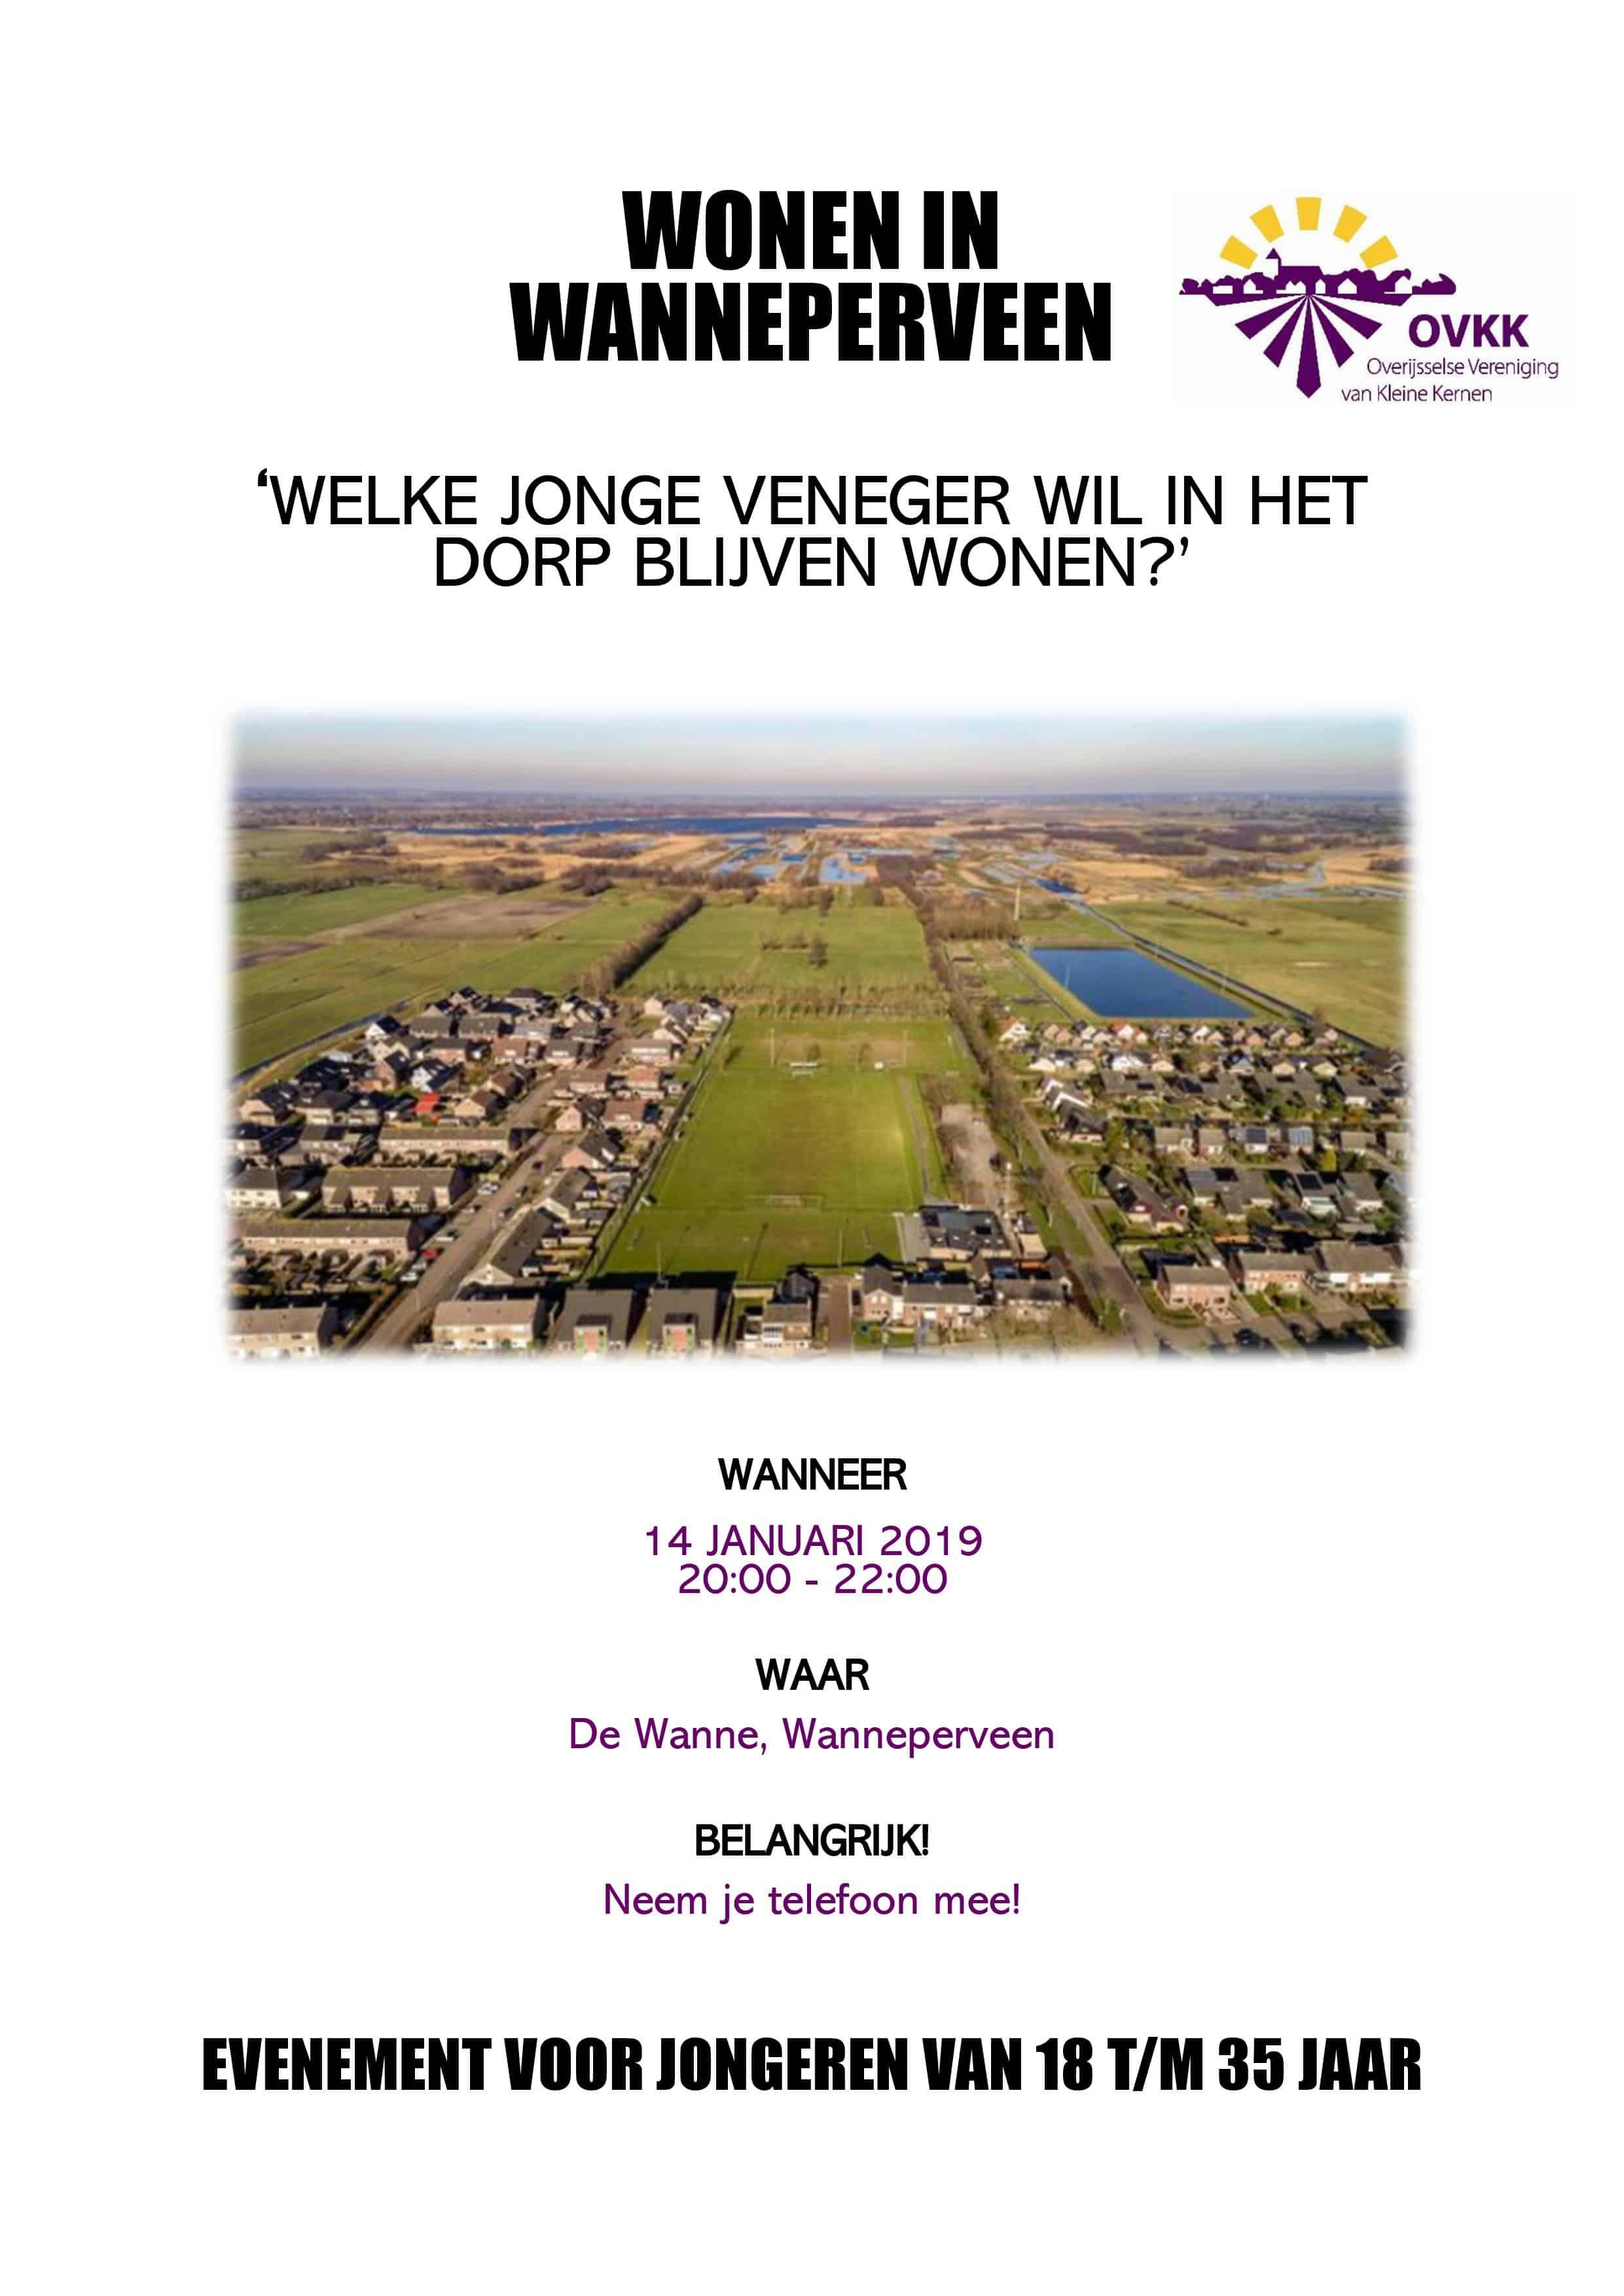 Wonen in Wanneperveen